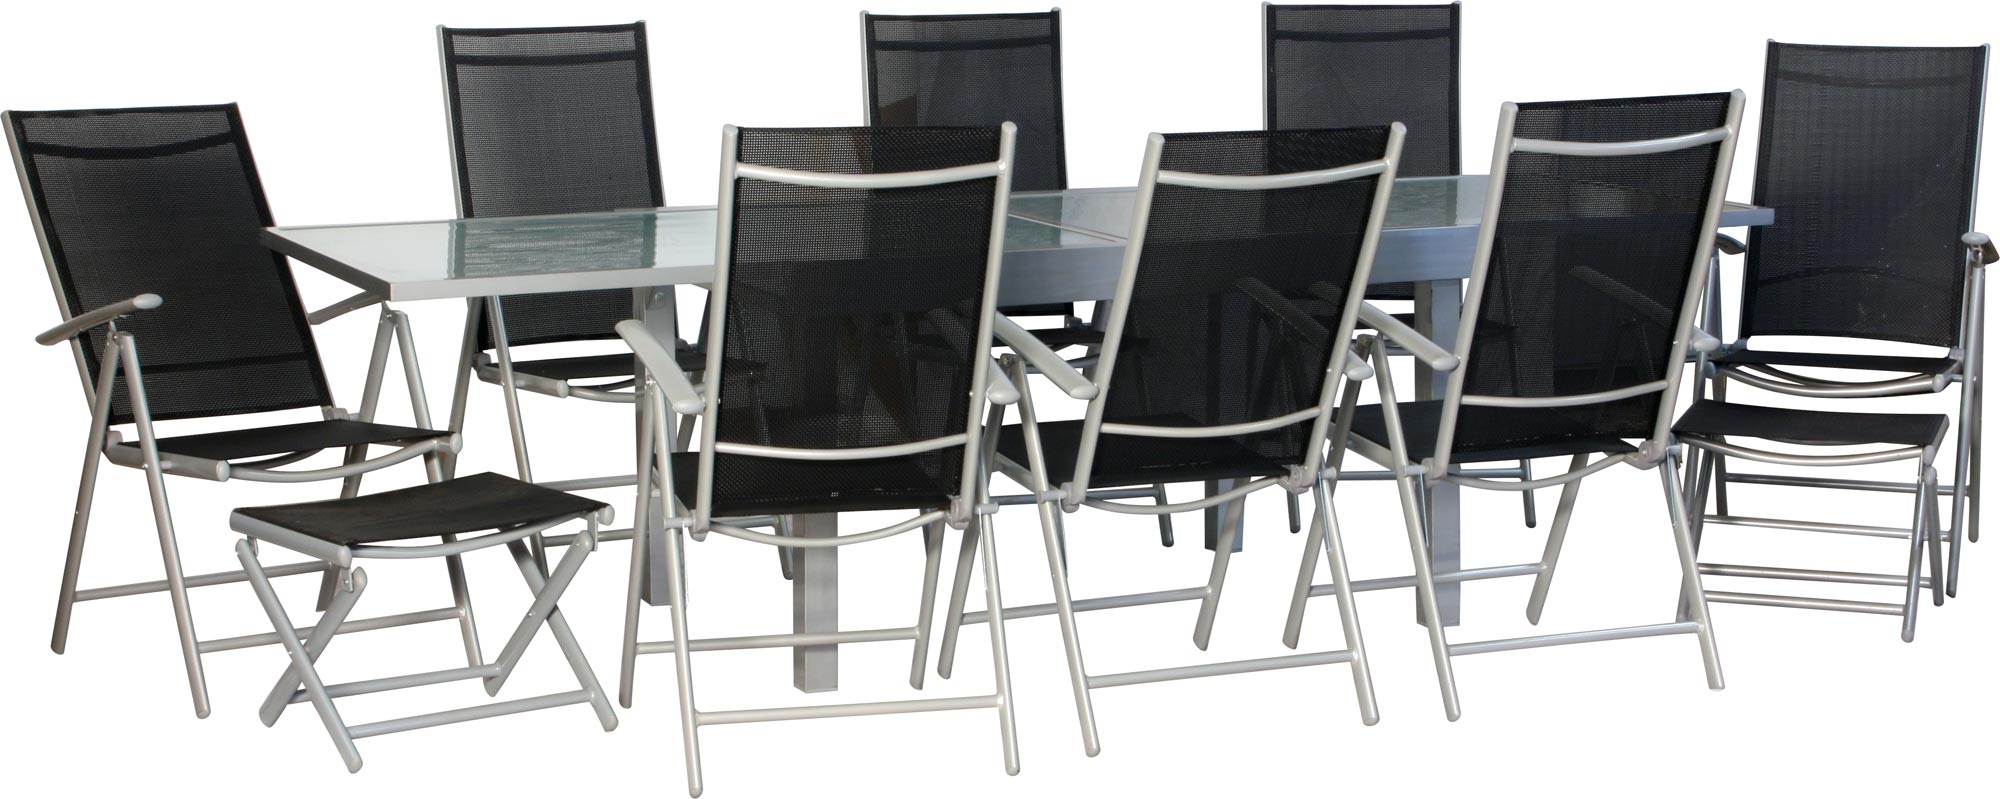 star xxl 19 tlg gartengarnitur gartenm bel gartengruppe garten sitzgruppe stuhl. Black Bedroom Furniture Sets. Home Design Ideas